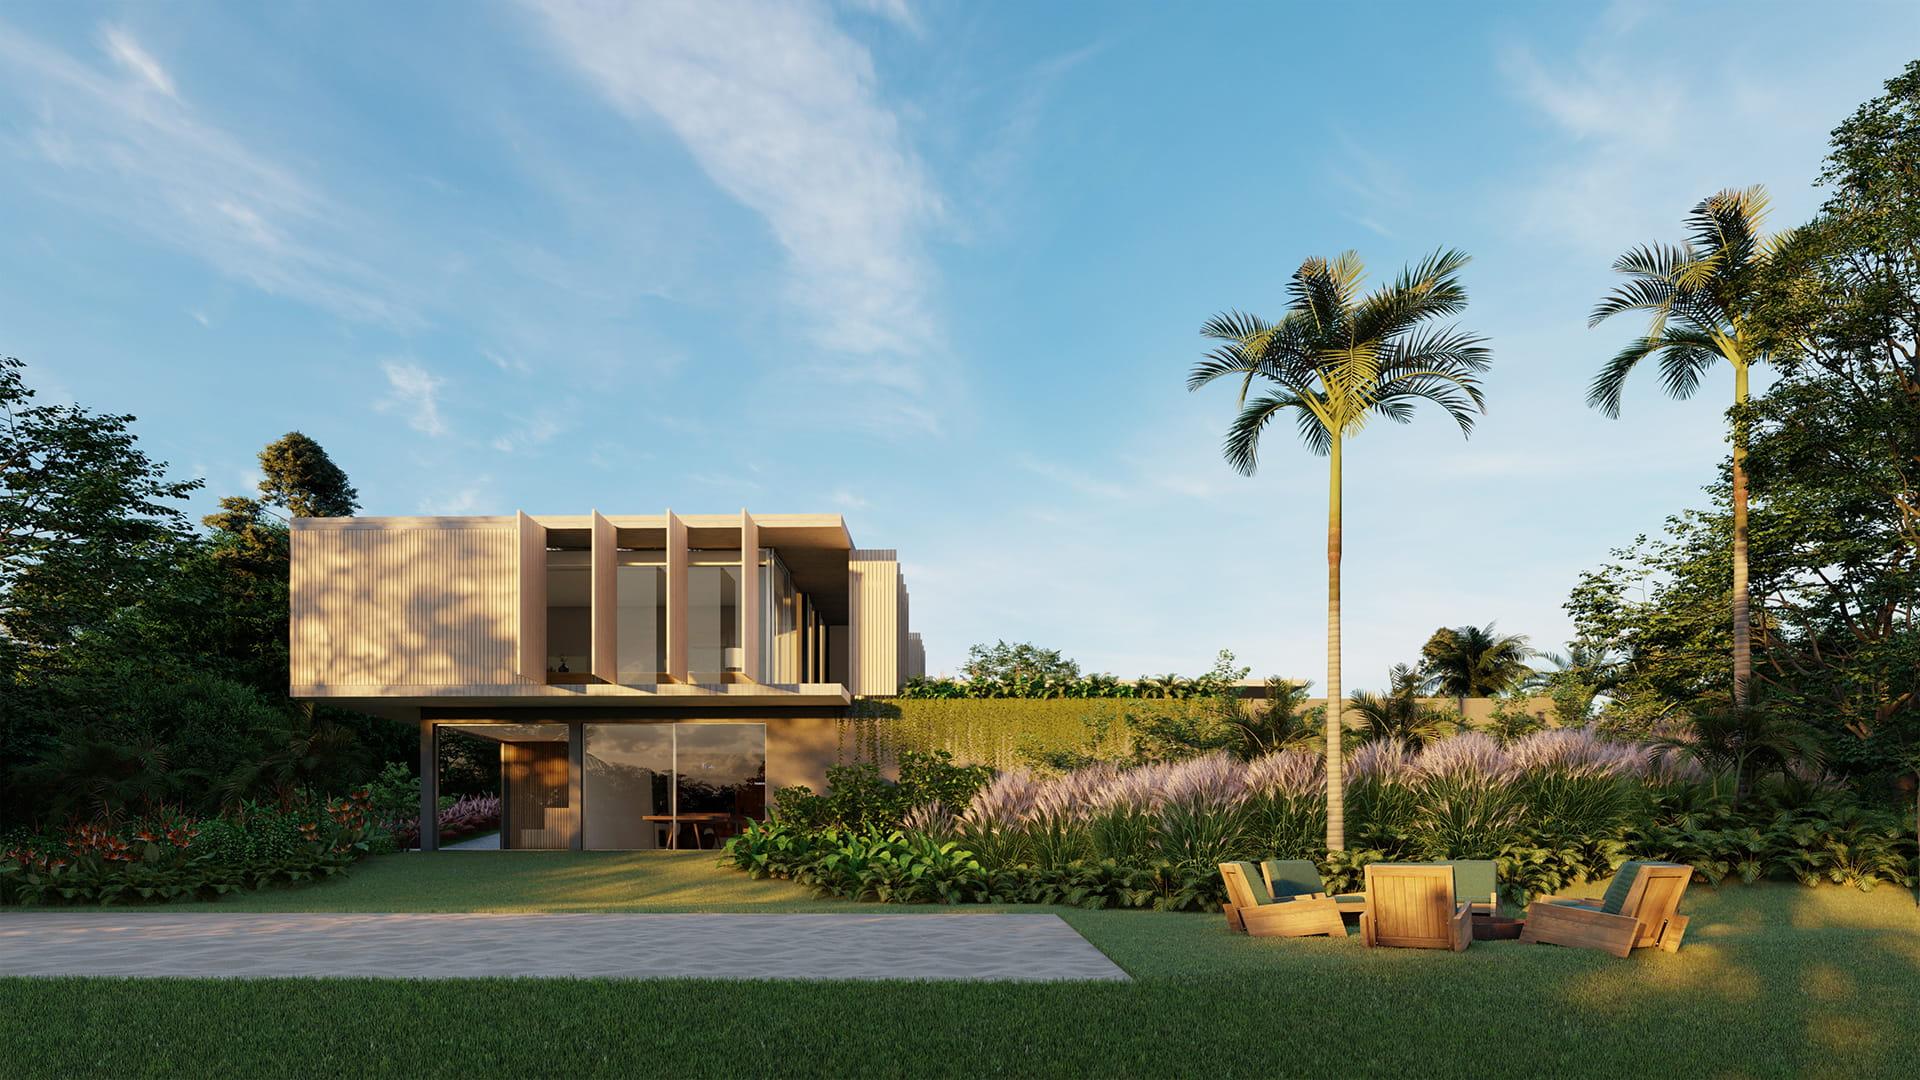 Sabella Arquitetura - Casa Concreto vista lazer